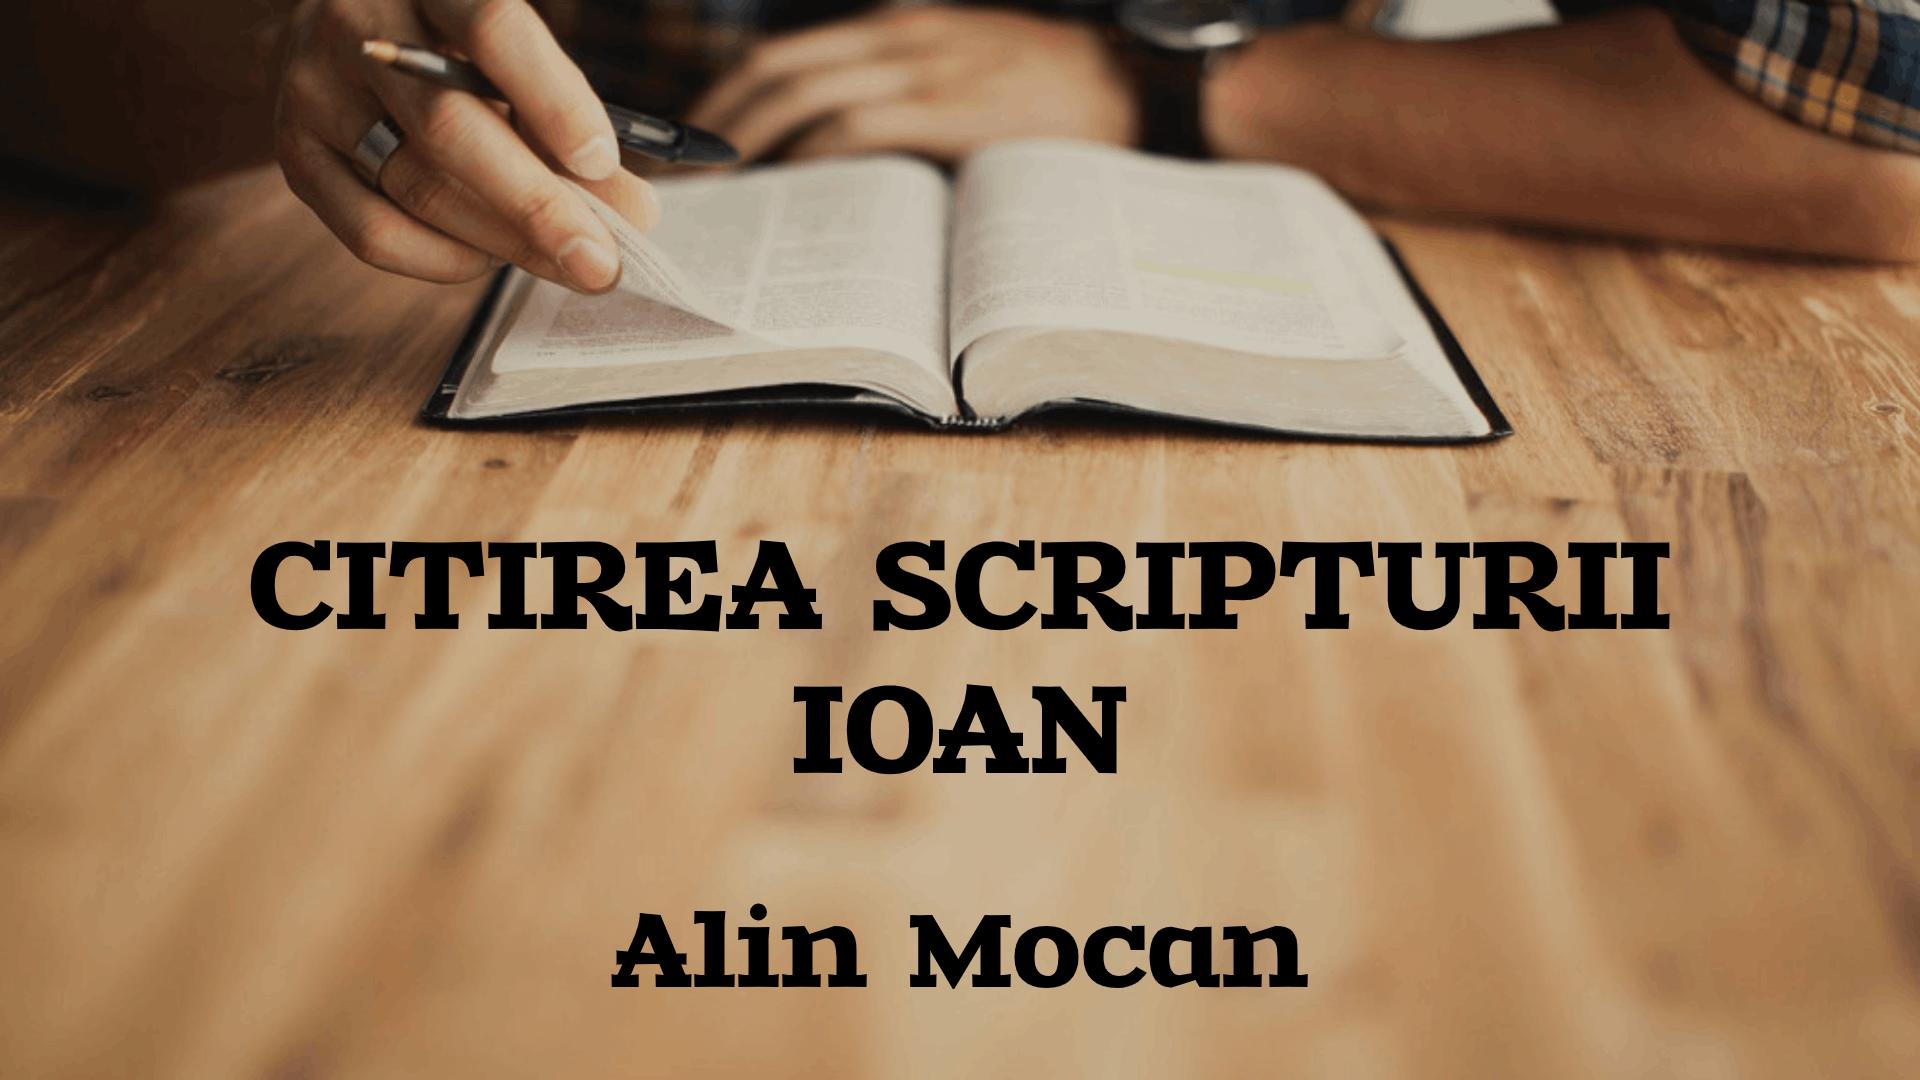 Citirea Scripturii - Ioan - Alin Mocan